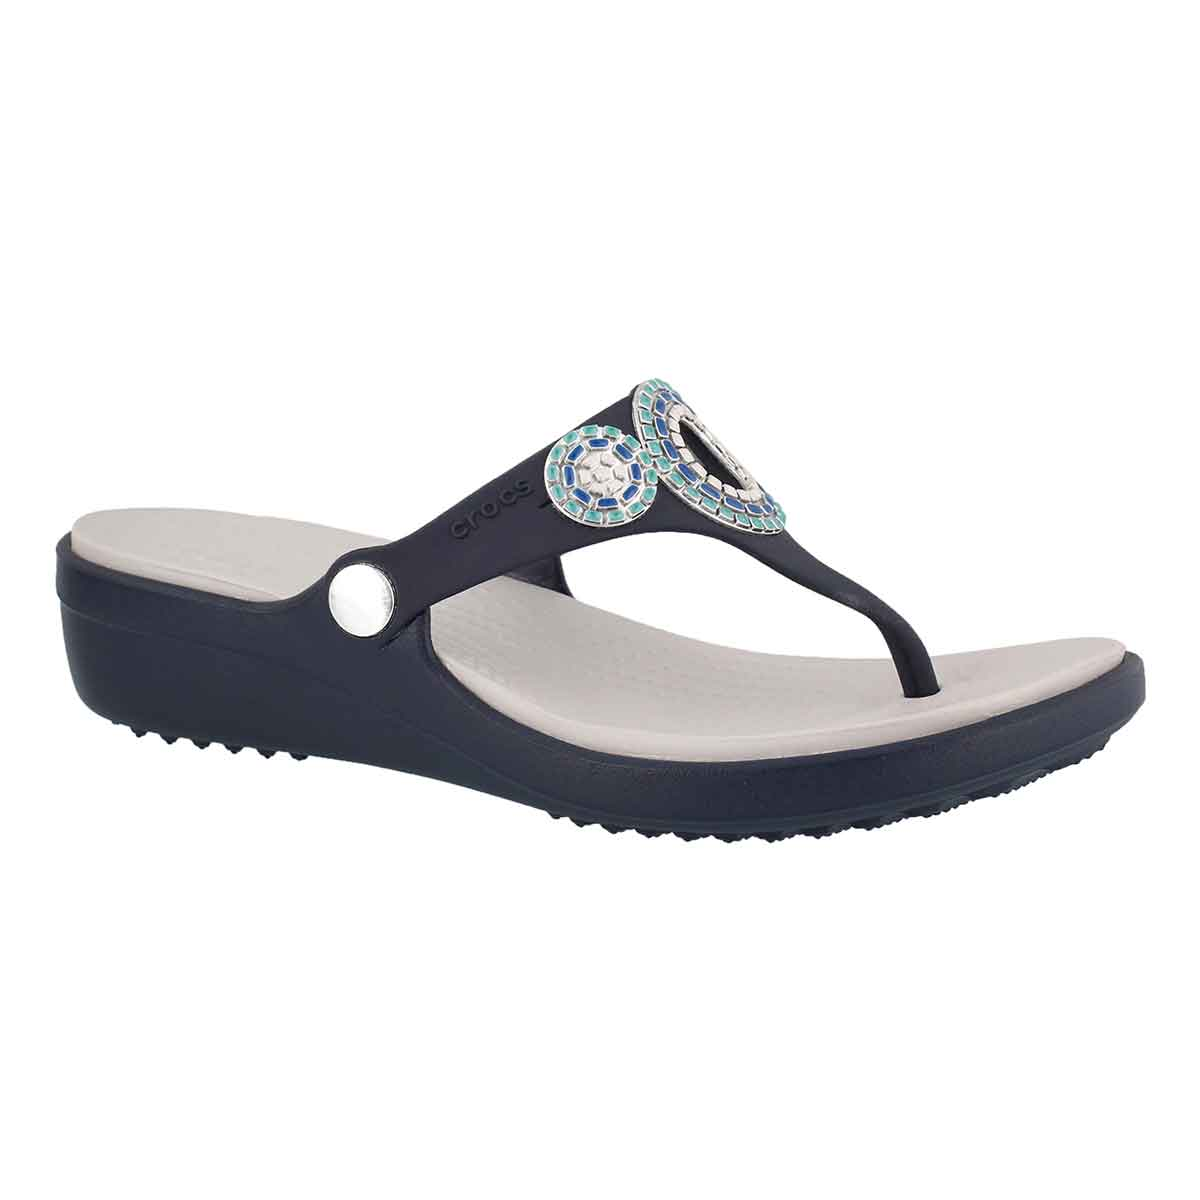 Women's SANRAH DIAMANTE nvy/turq sandals